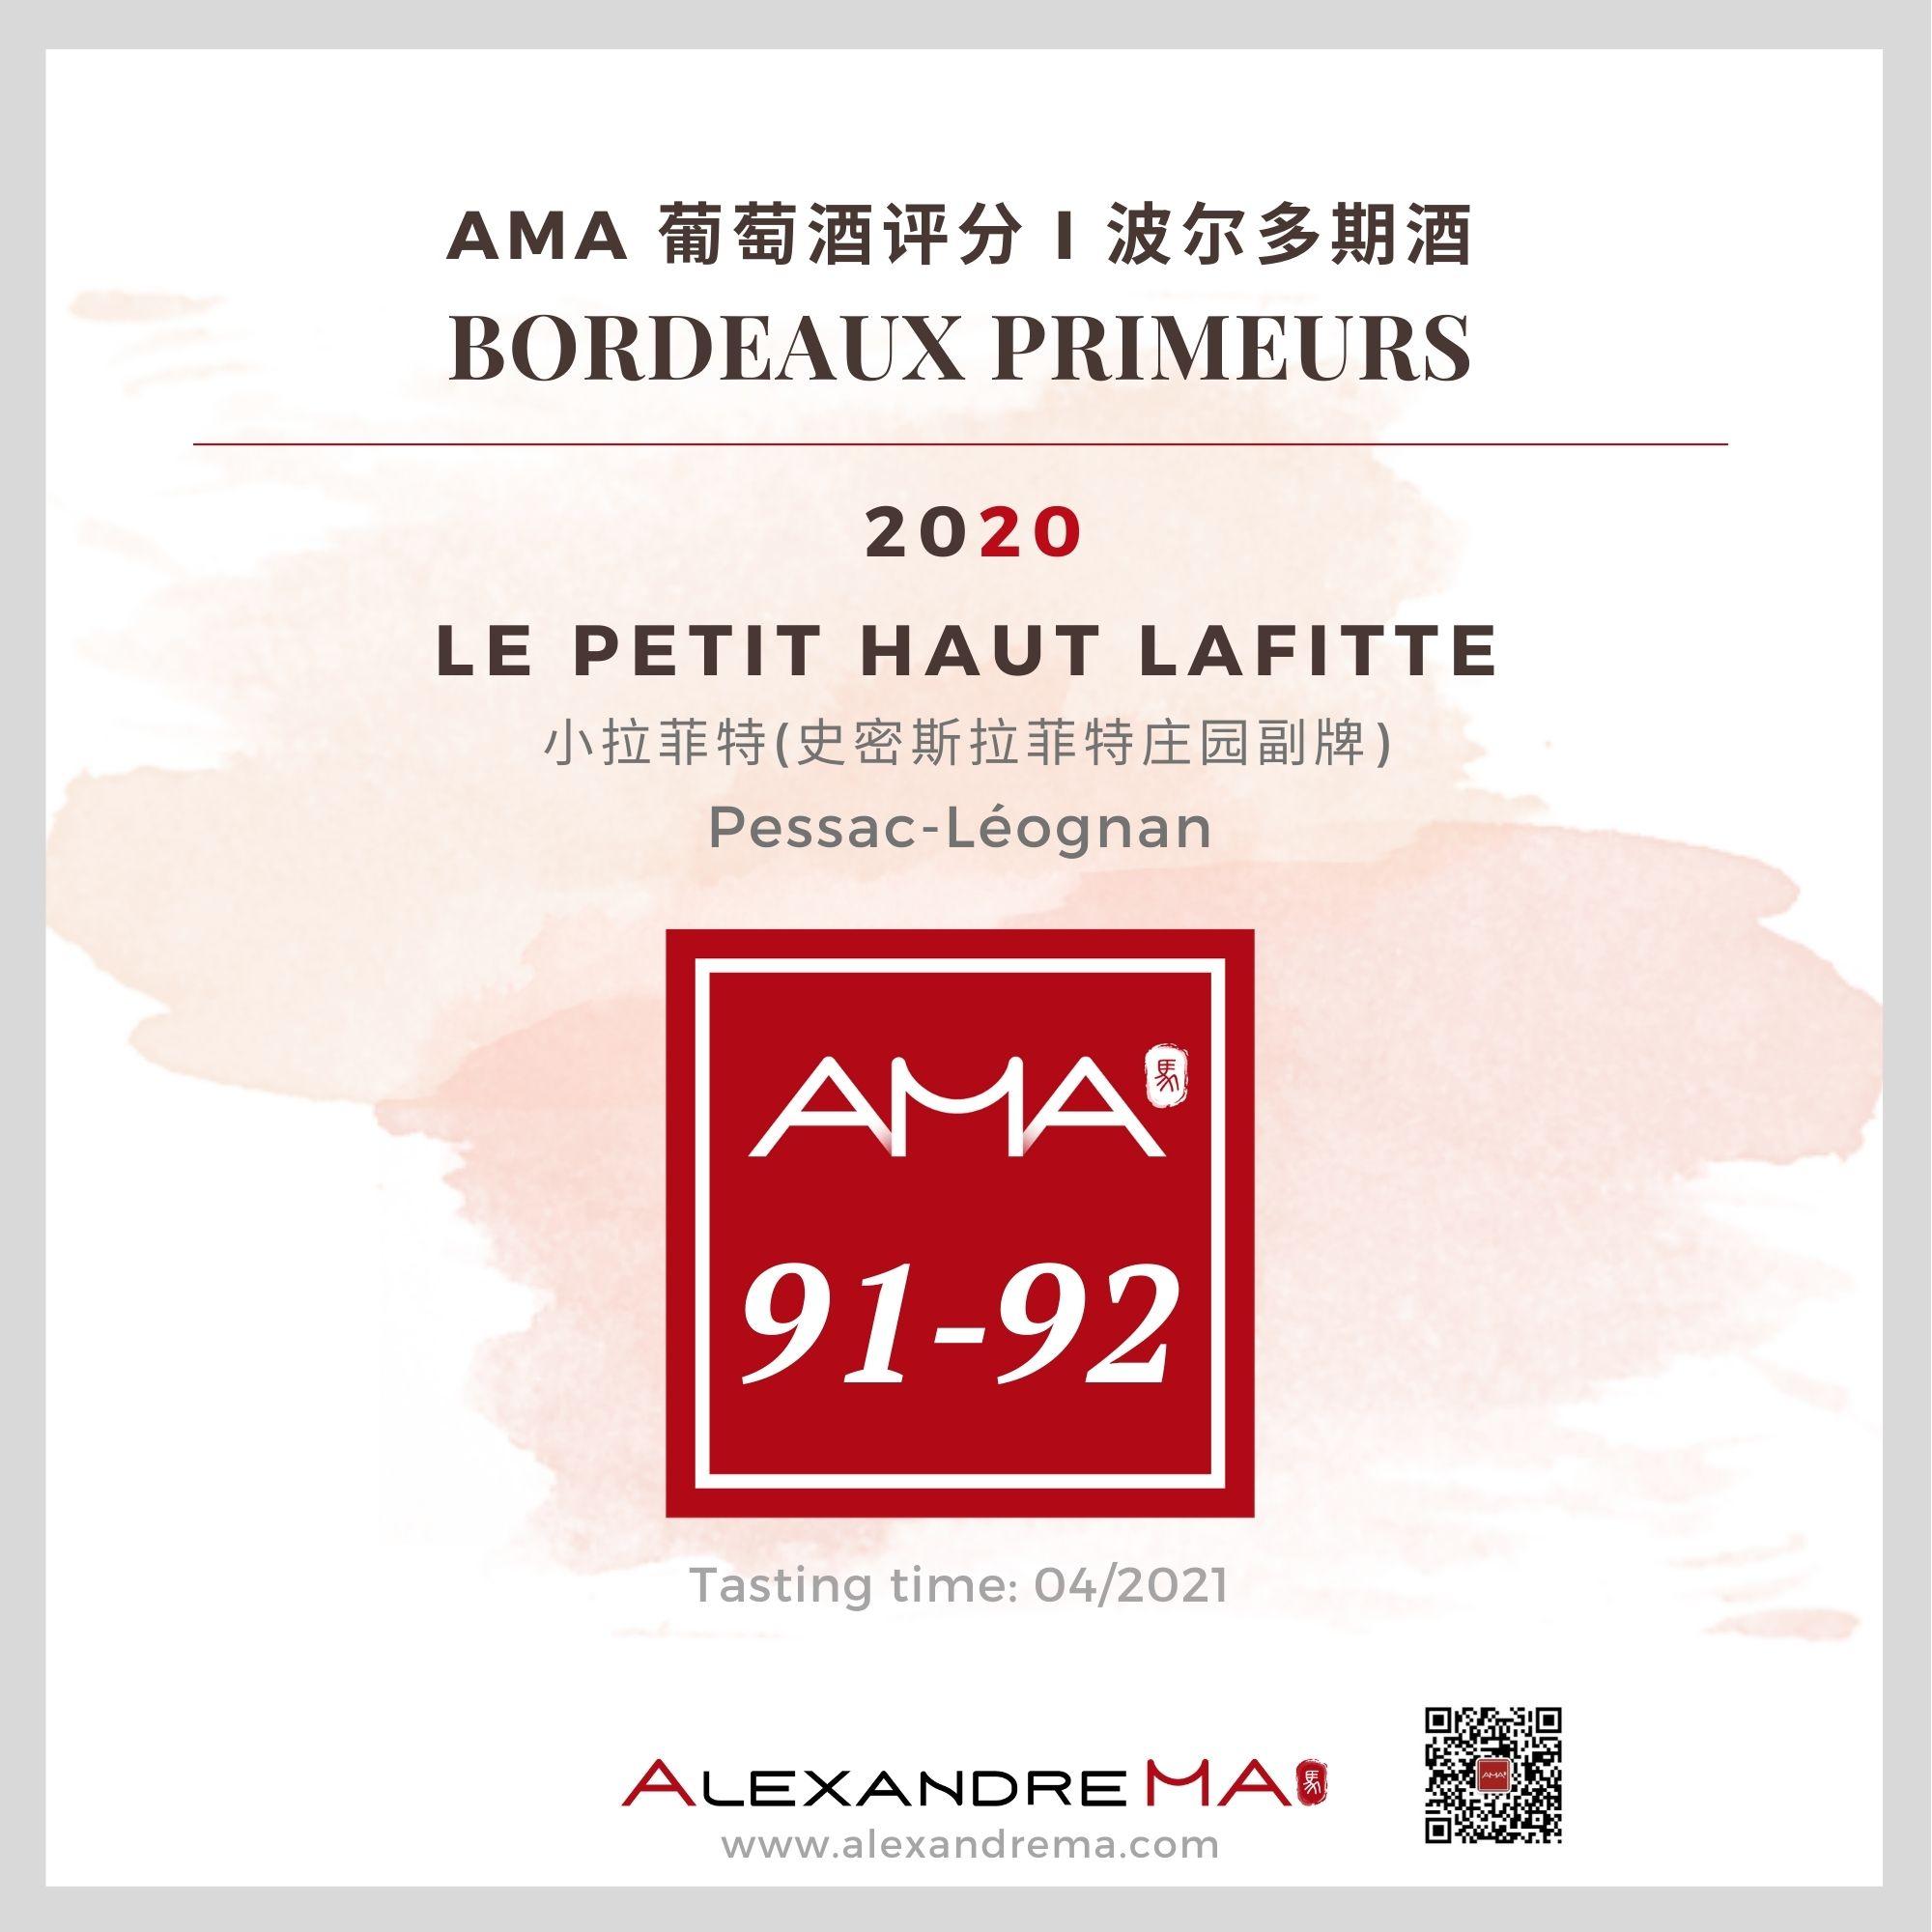 Château Smith Haut Lafitte – Le Petit Haut Lafitte 2020 小拉菲特 - Alexandre Ma